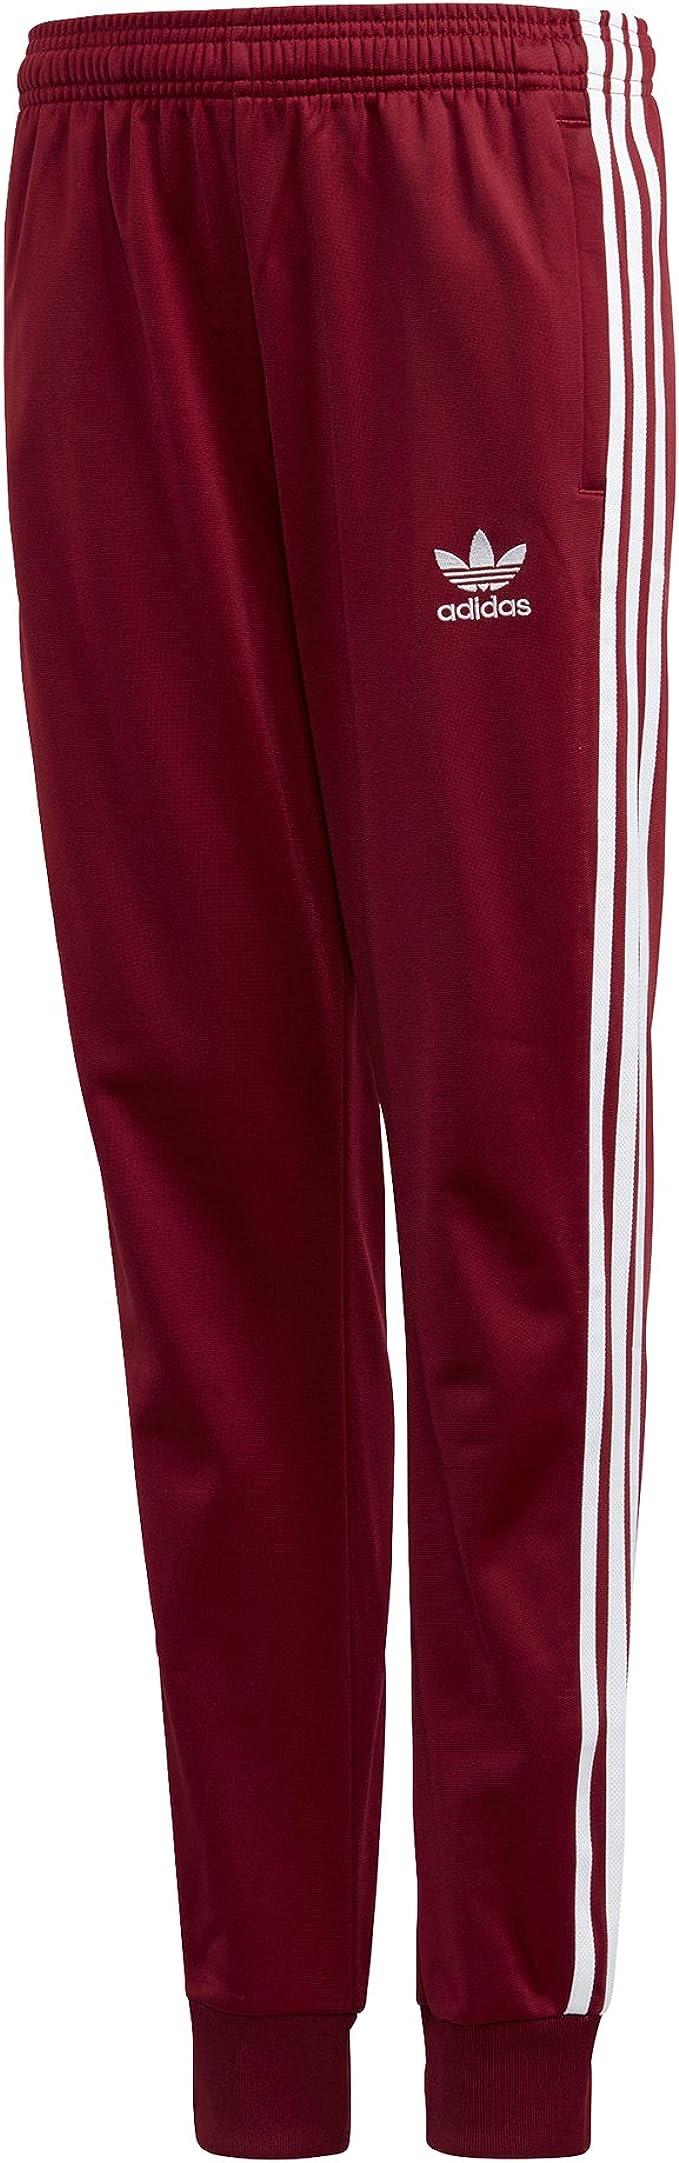 conversacion Facultad roble  adidas sst track pants burgundy off 57% - filetrack.nagarpalikanokha.com